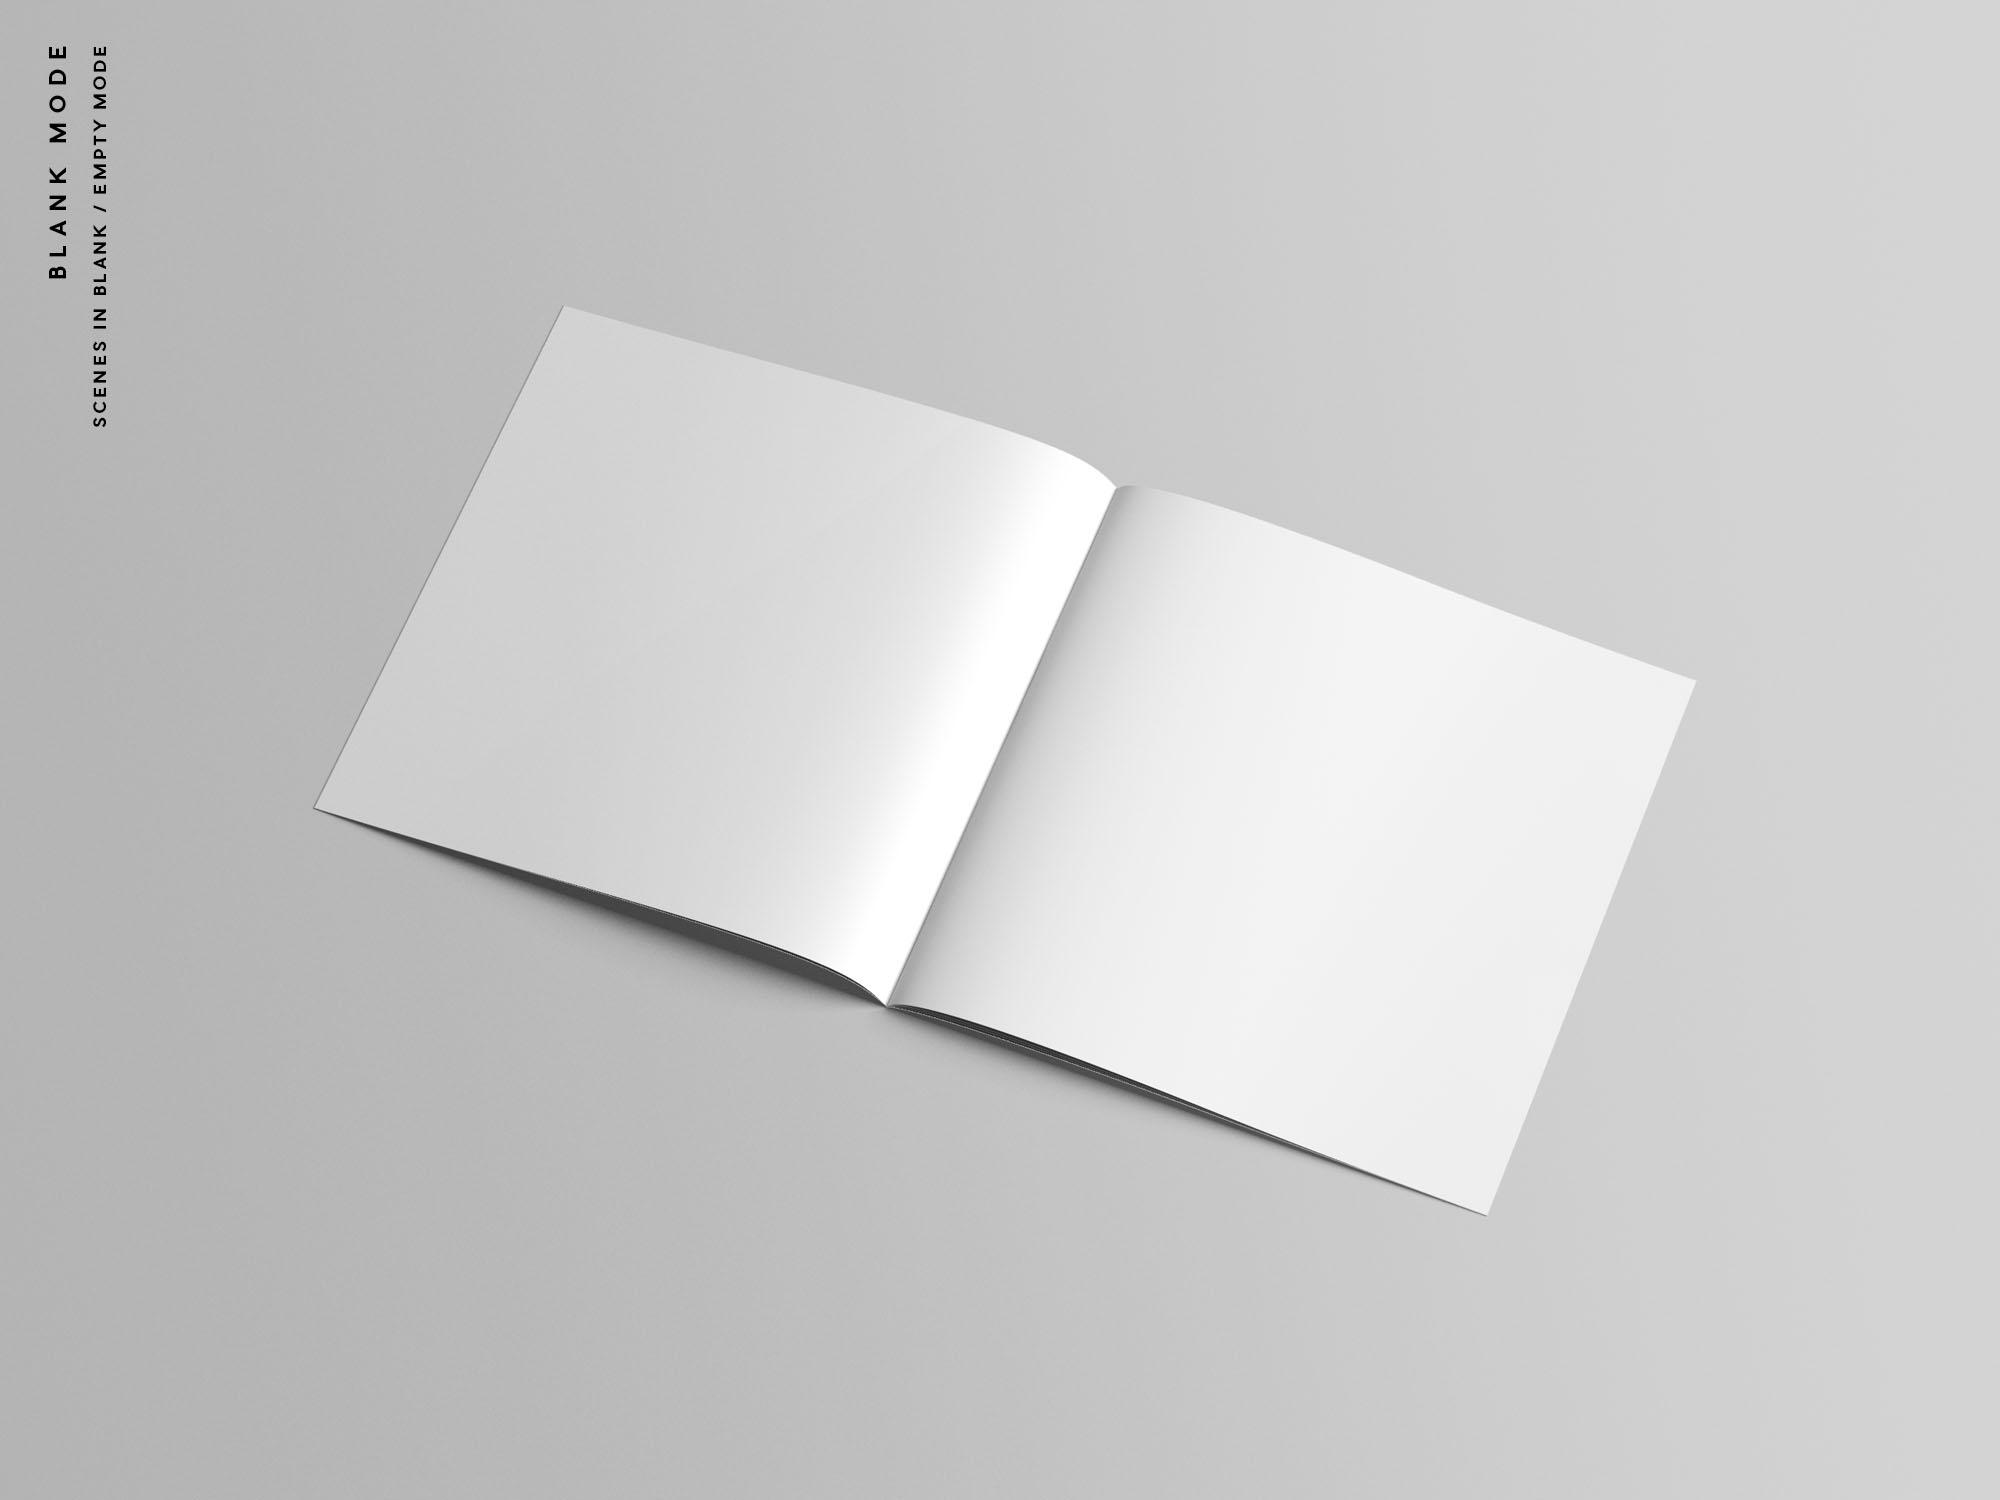 Square Brochure Mockup - Blank Mode